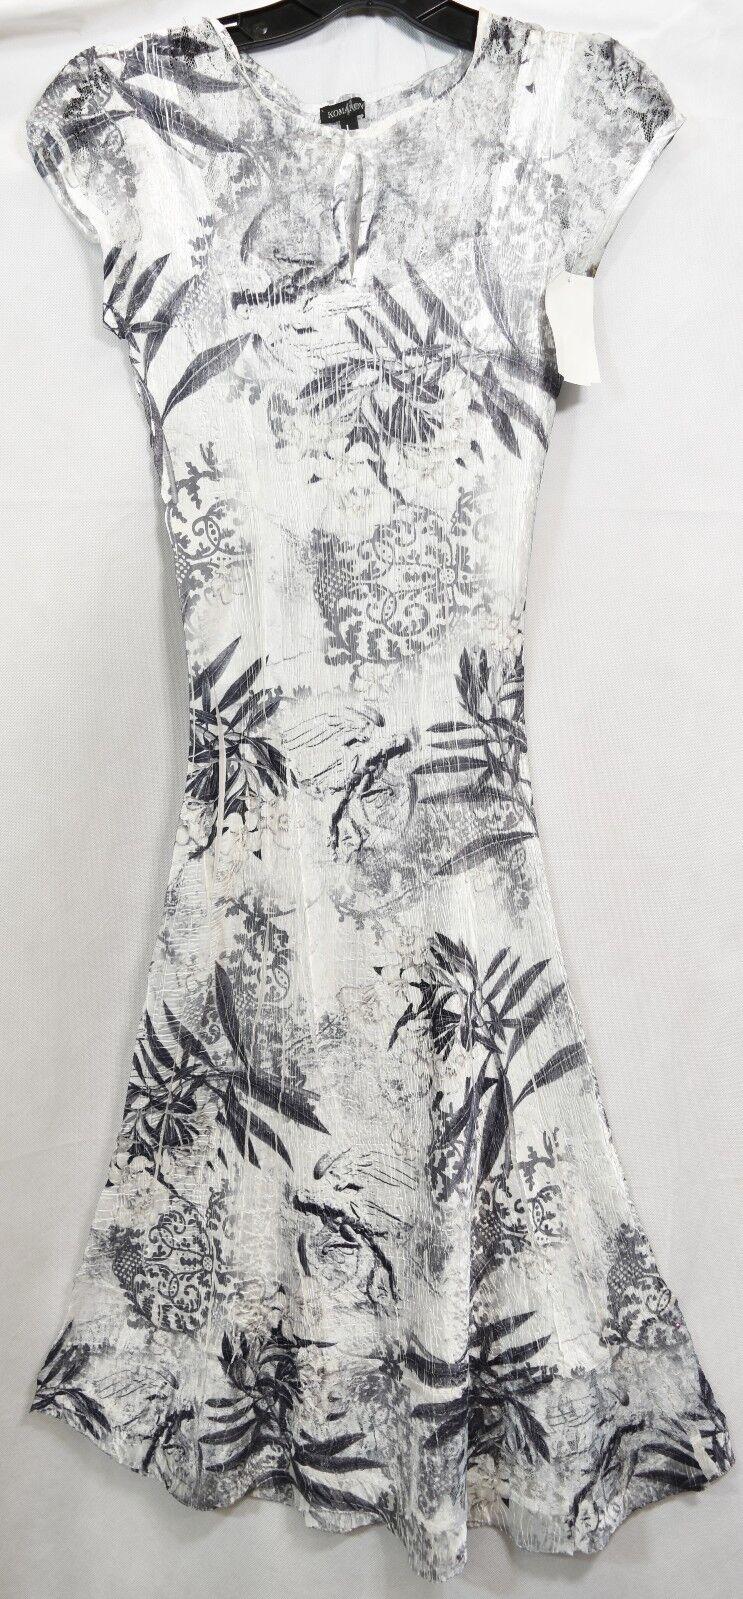 300 KOMAROV Cap Sleeve Keyhole Fit & Flare Dress Dress Dress Floral  Wedding WALL FLOWER a39b7c